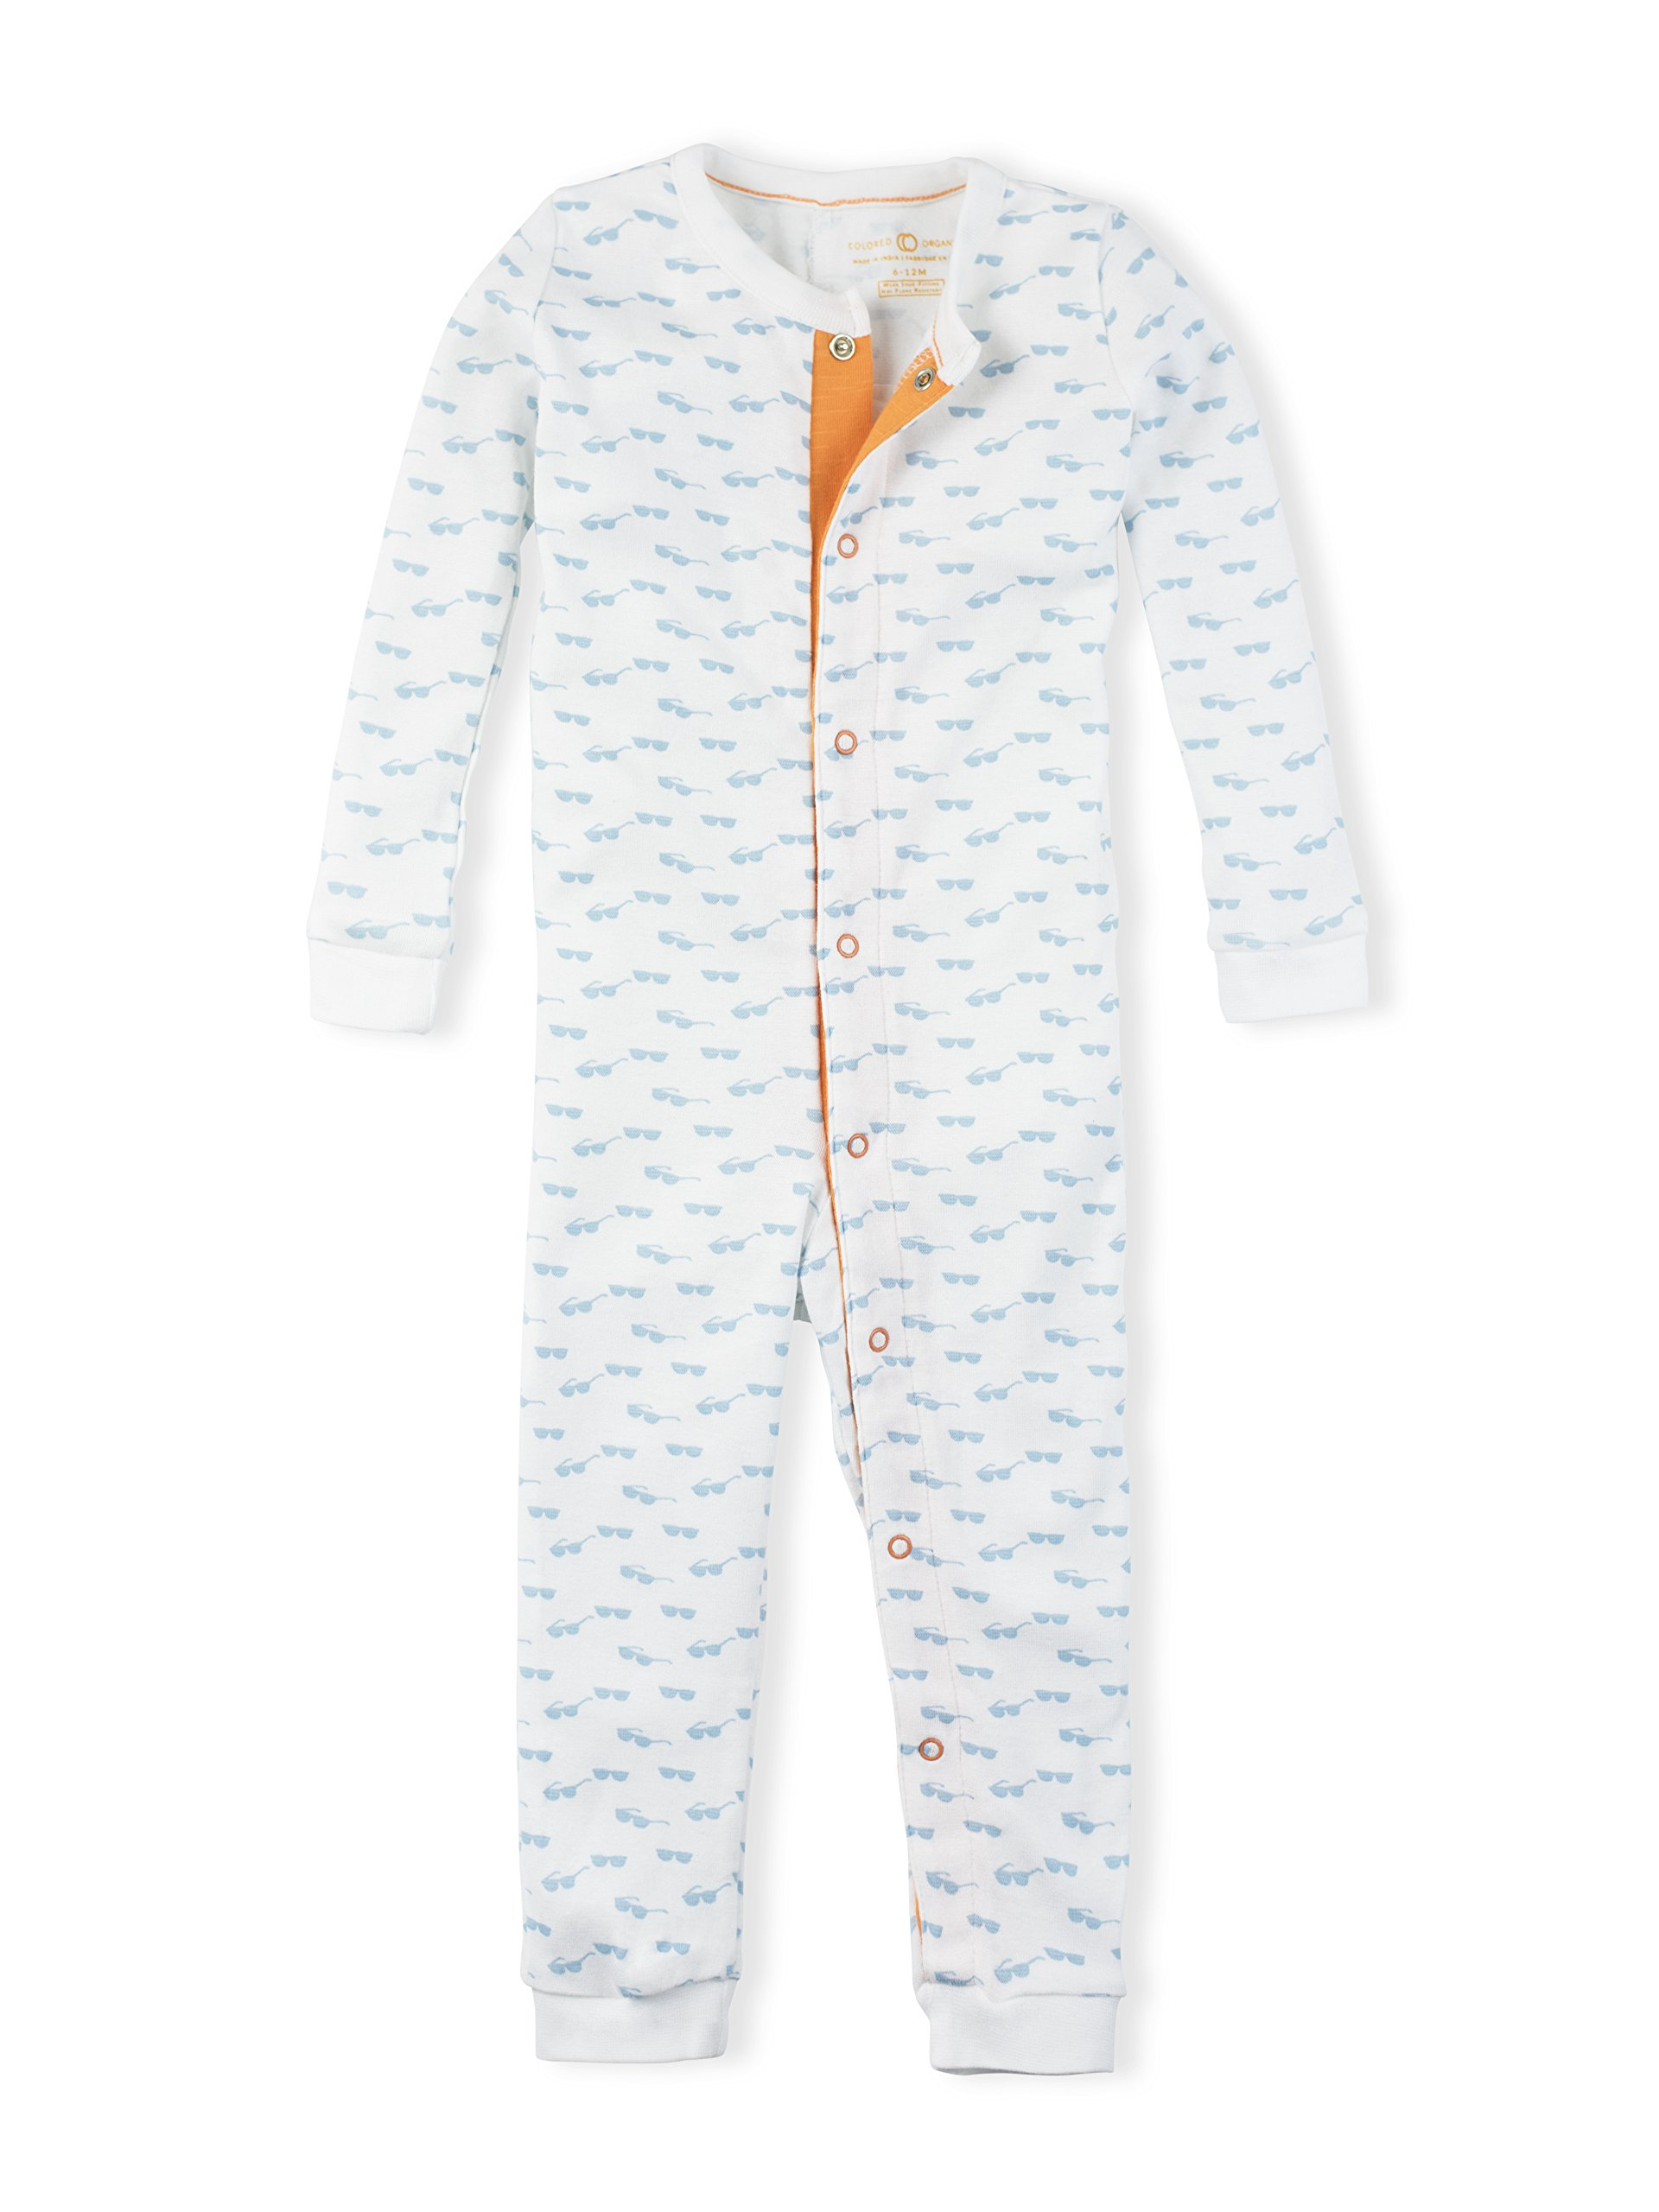 Colored Organics Baby Unisex Peyton Long Sleeve Organic Sleeper - White/Mist Sunglass Print - 18-24M by Colored Organics